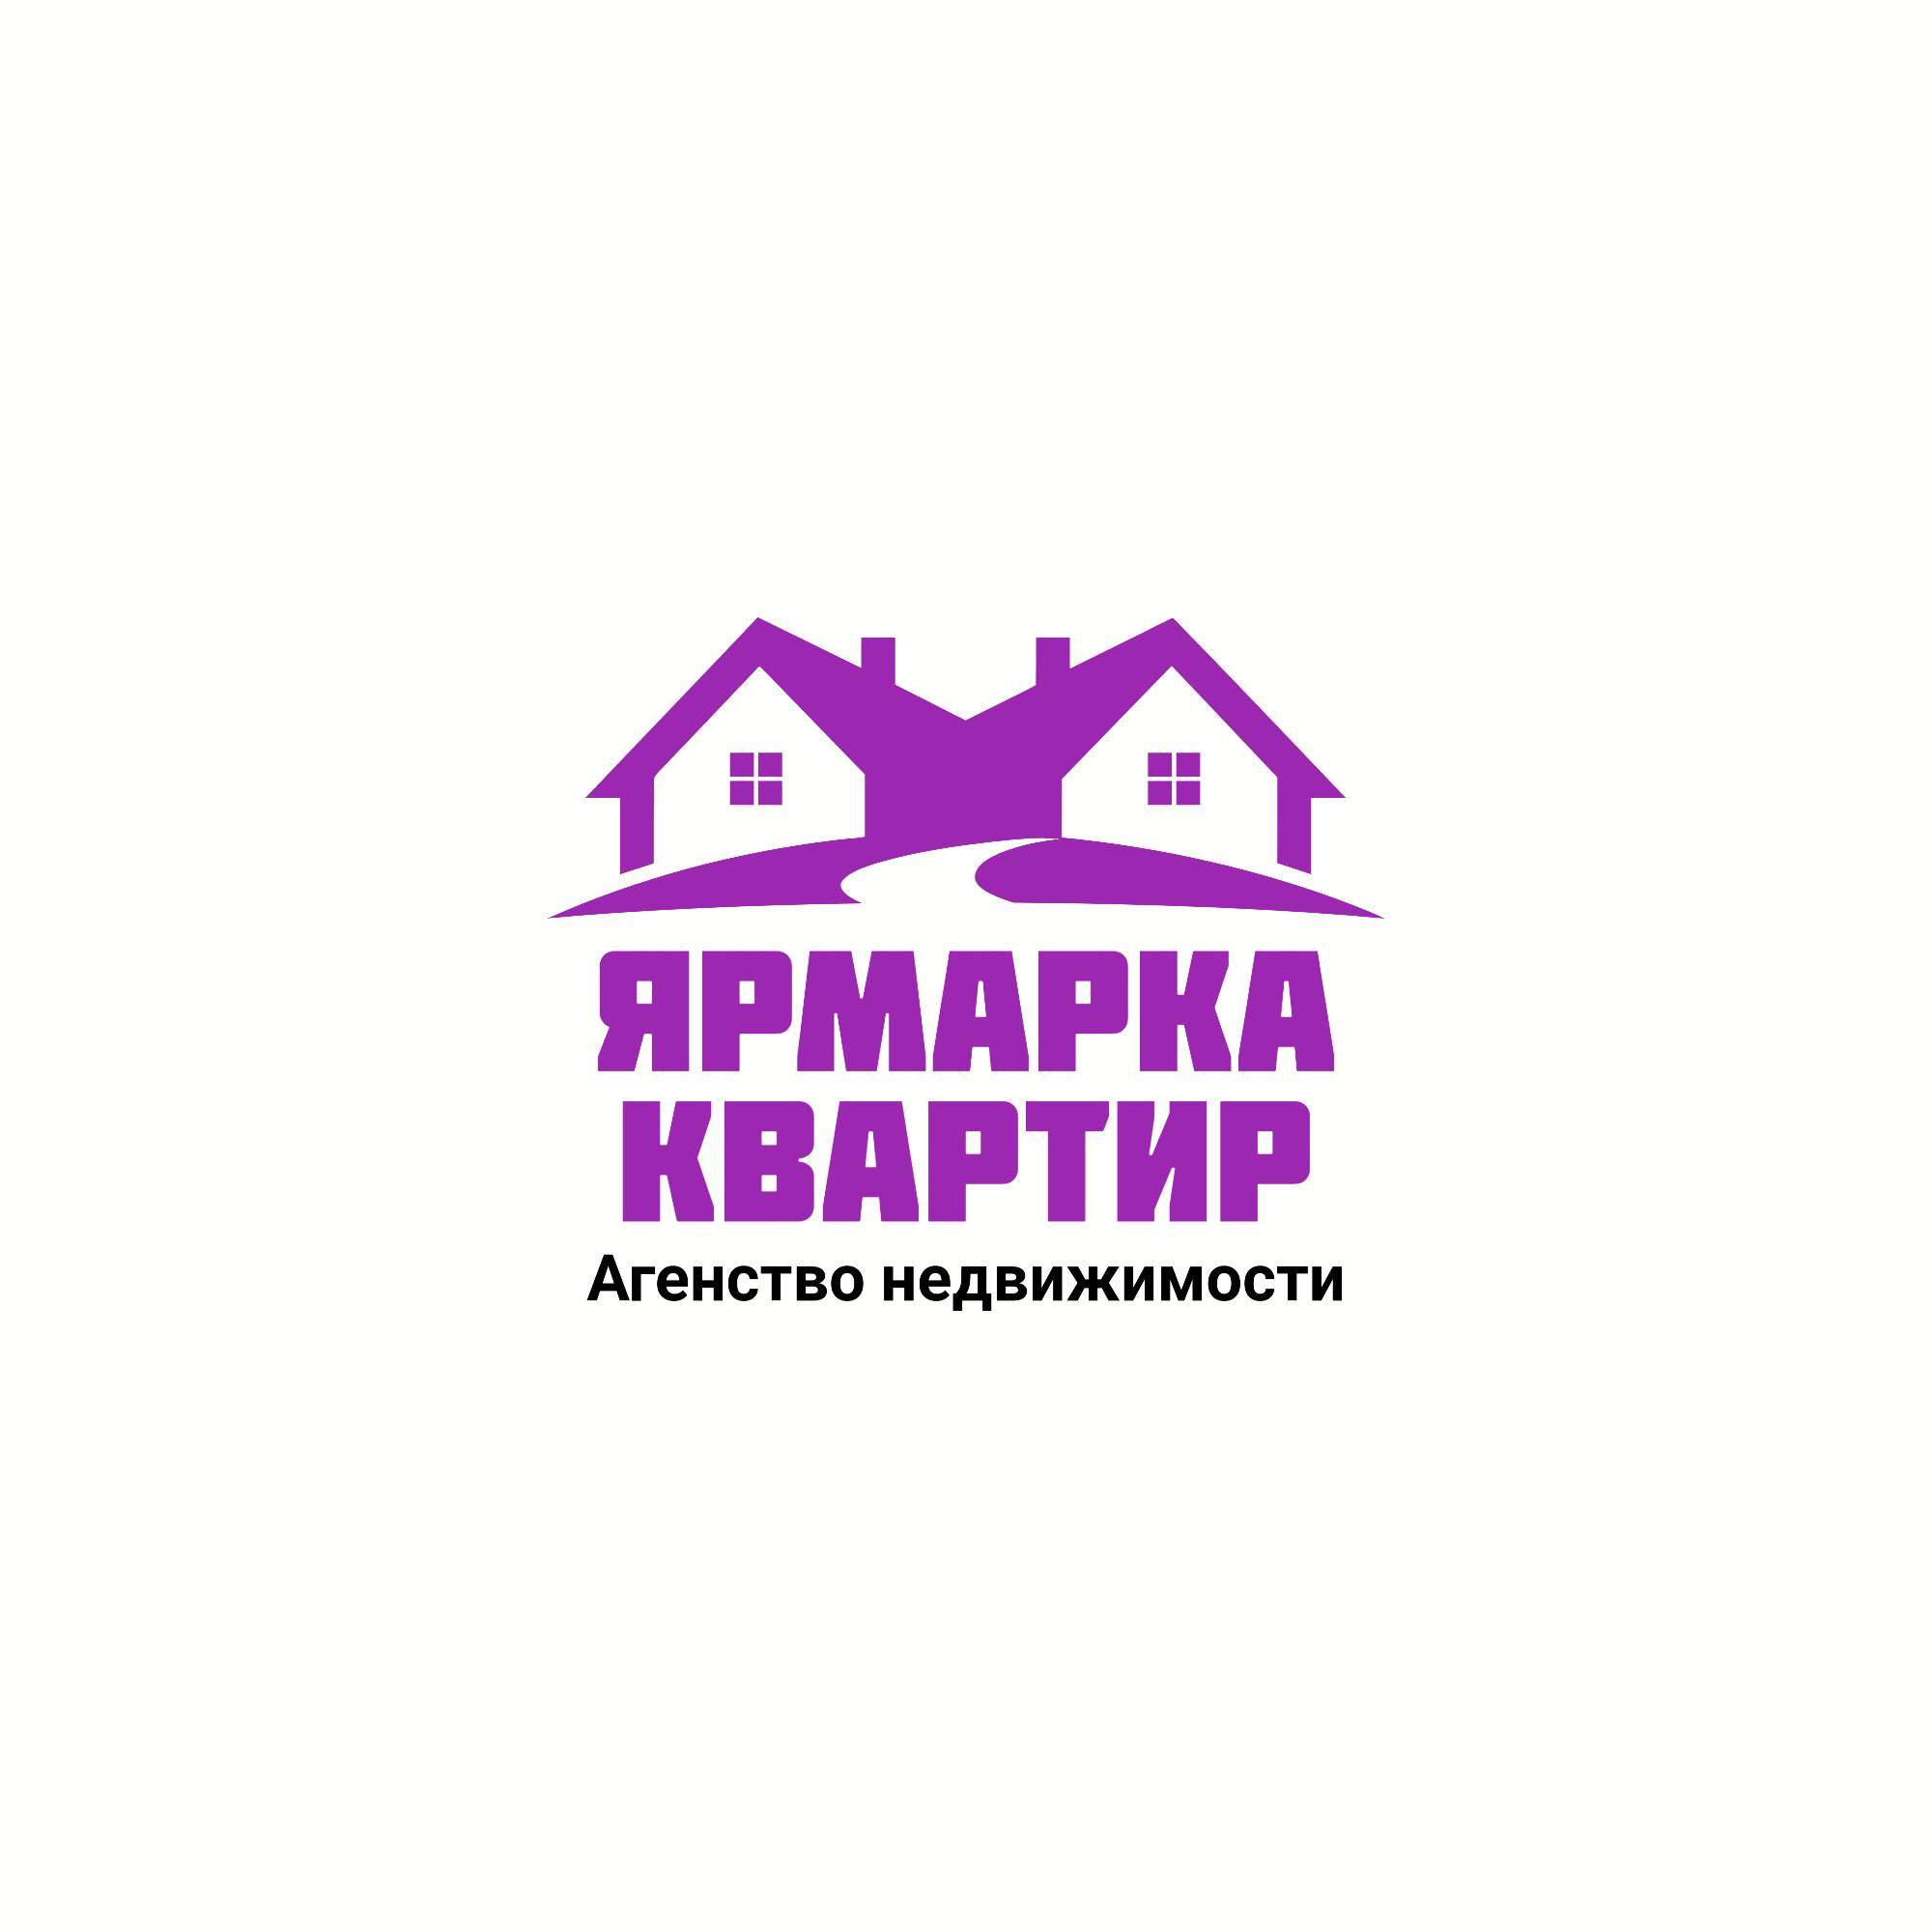 Создание логотипа, с вариантами для визитки и листовки фото f_26860057f7921dc3.jpg